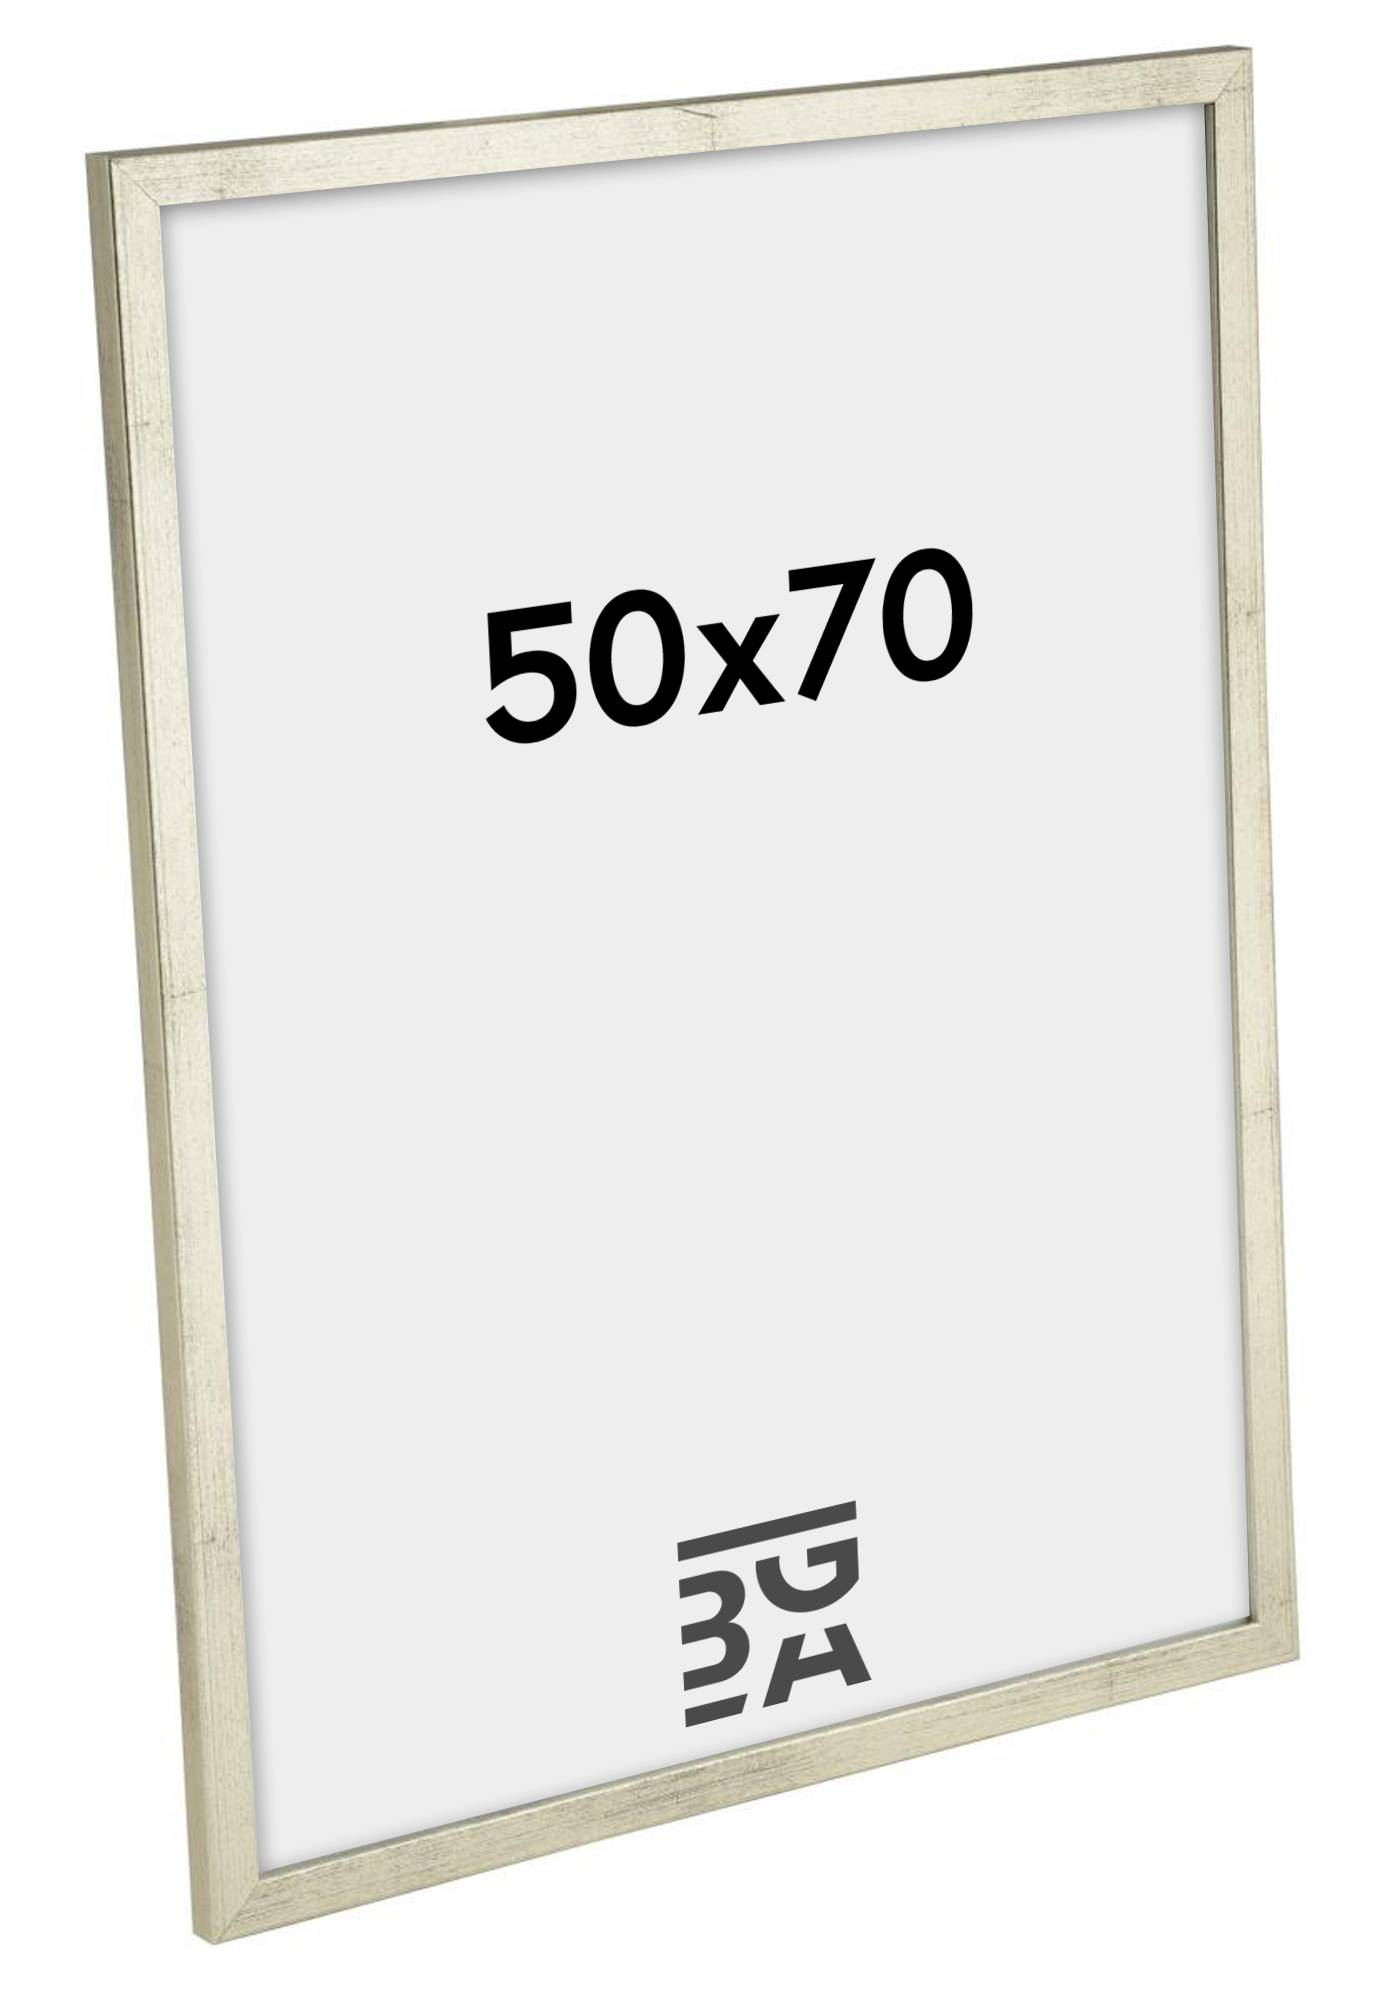 Estancia Galant Hopeanvärinen 50x70 cm